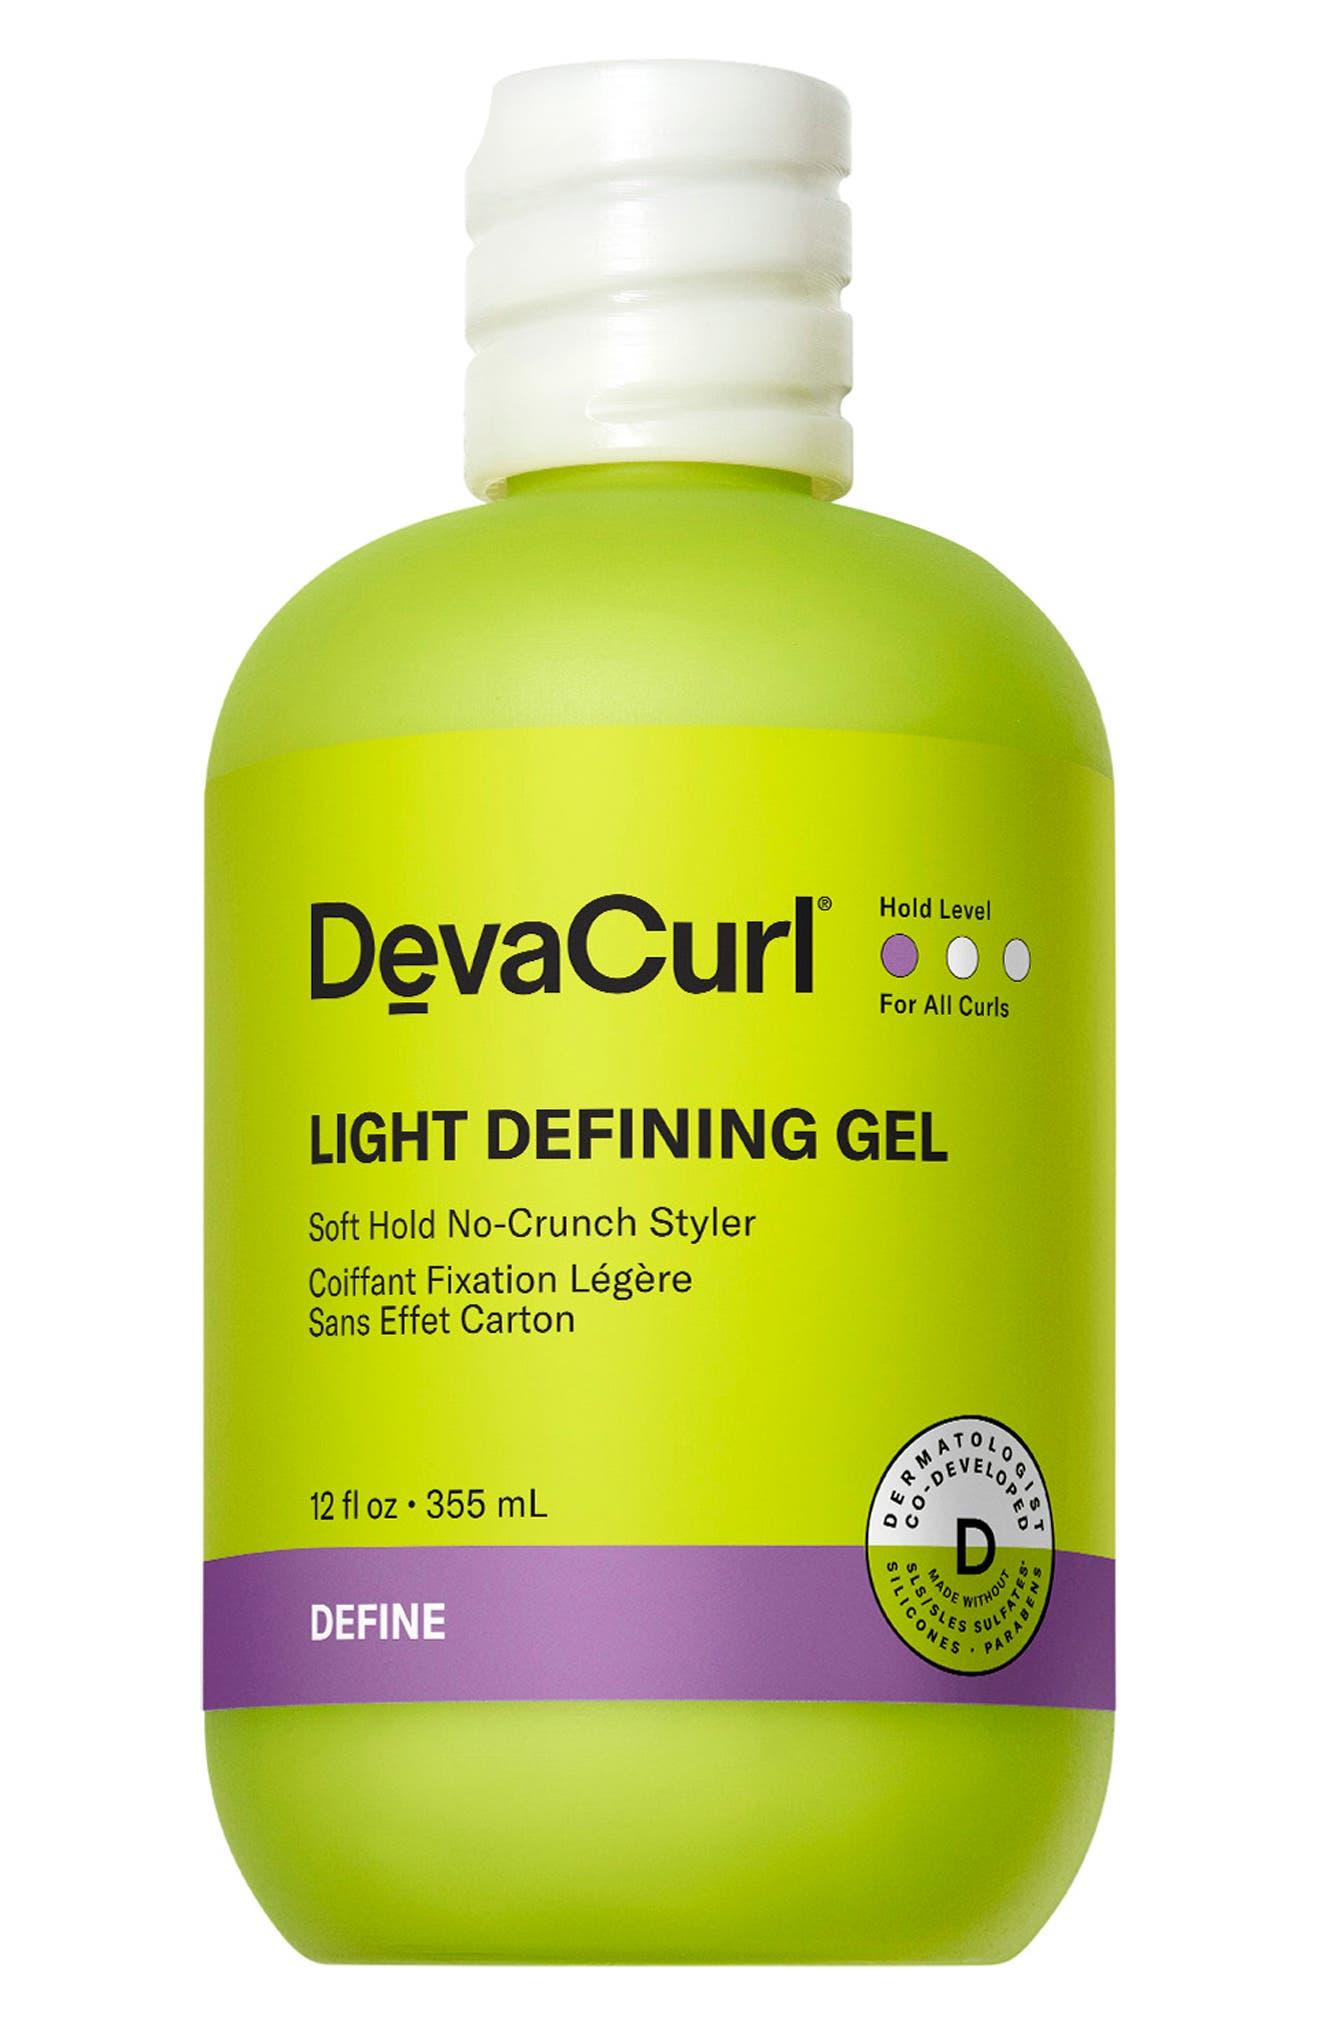 Light Defining Gel Soft Hold No-Crunch Styler